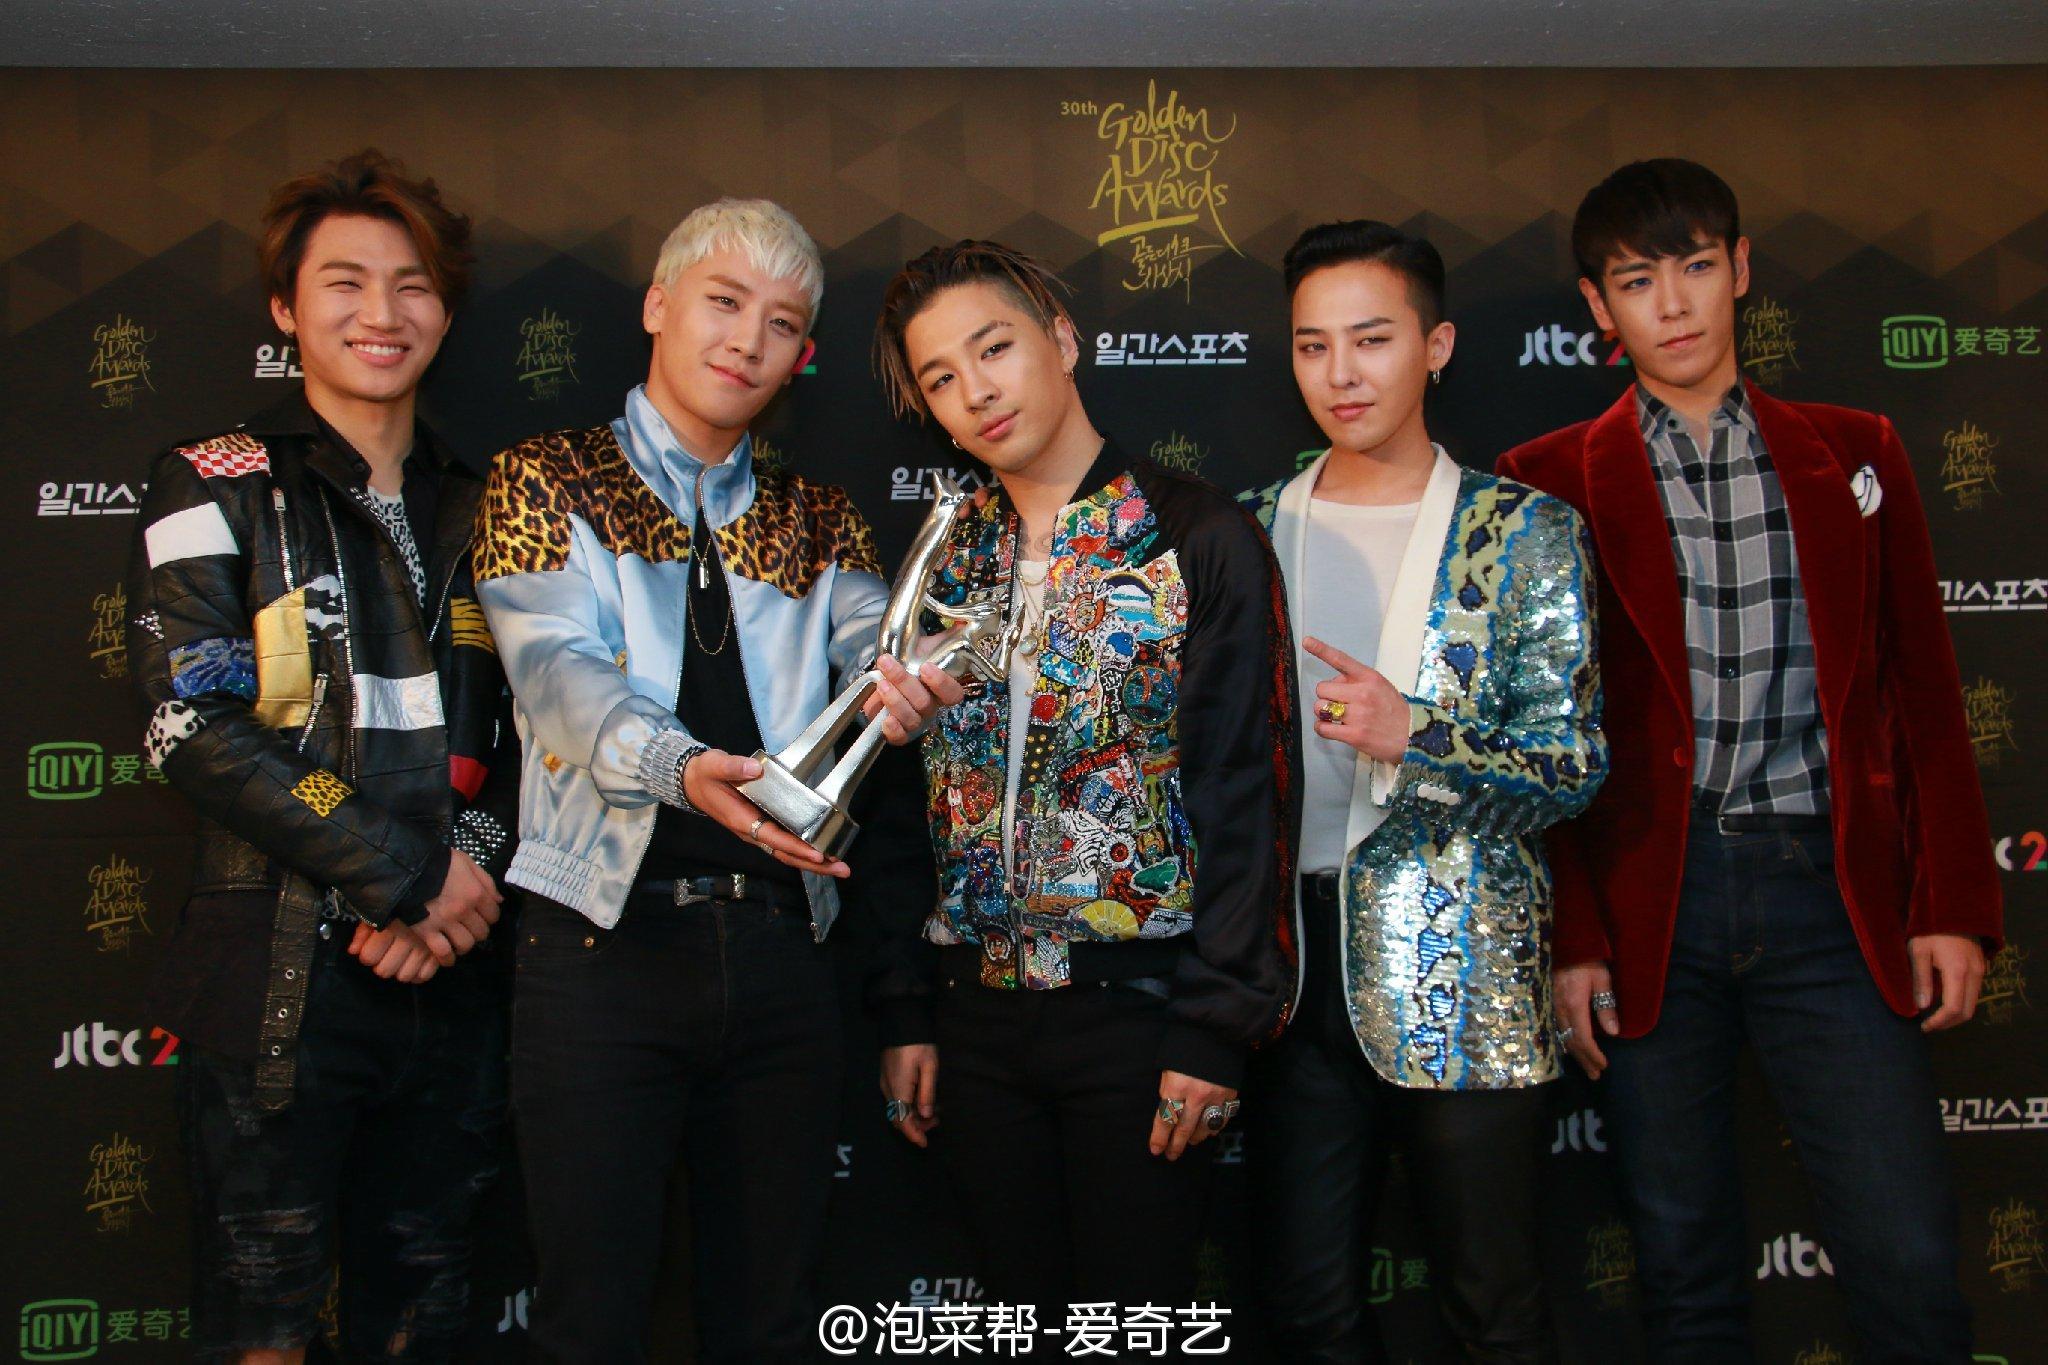 BIGBANG - Golden Disk Awards - Backstage - 20jan2016 - 泡菜帮-爱奇艺 - 13